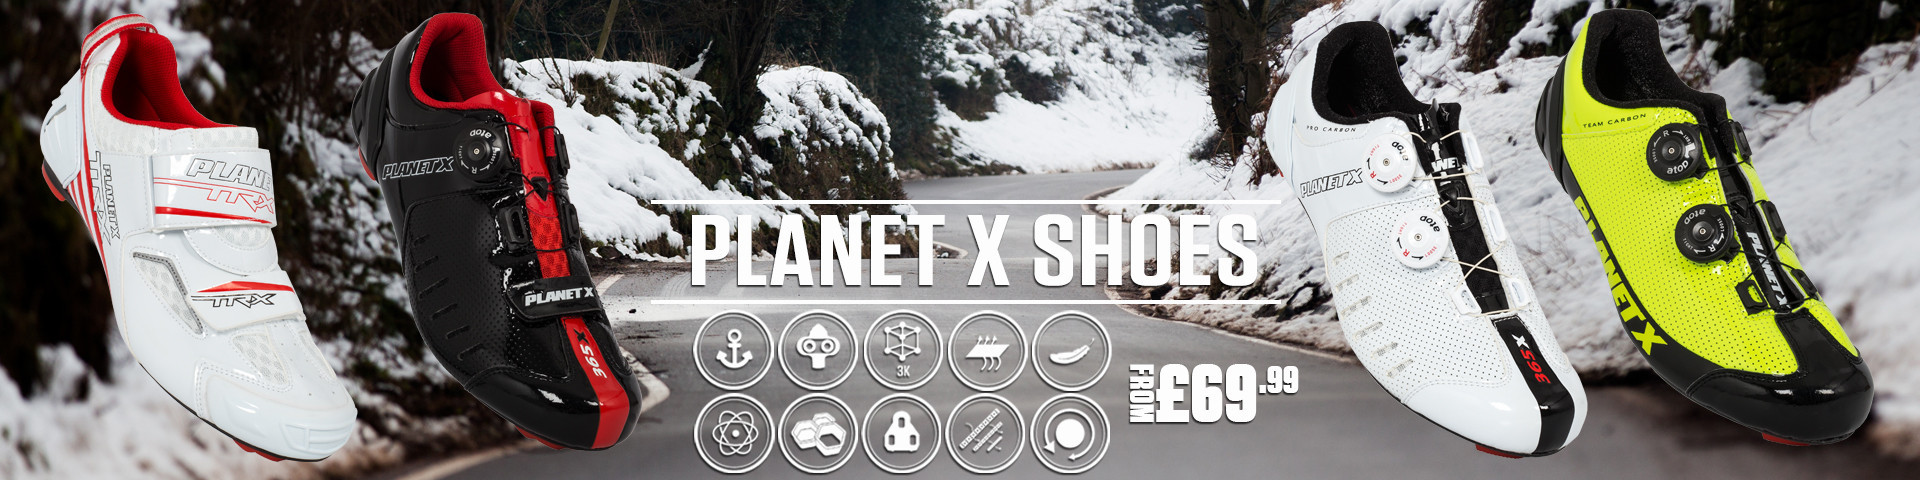 Planet X Road Shoes